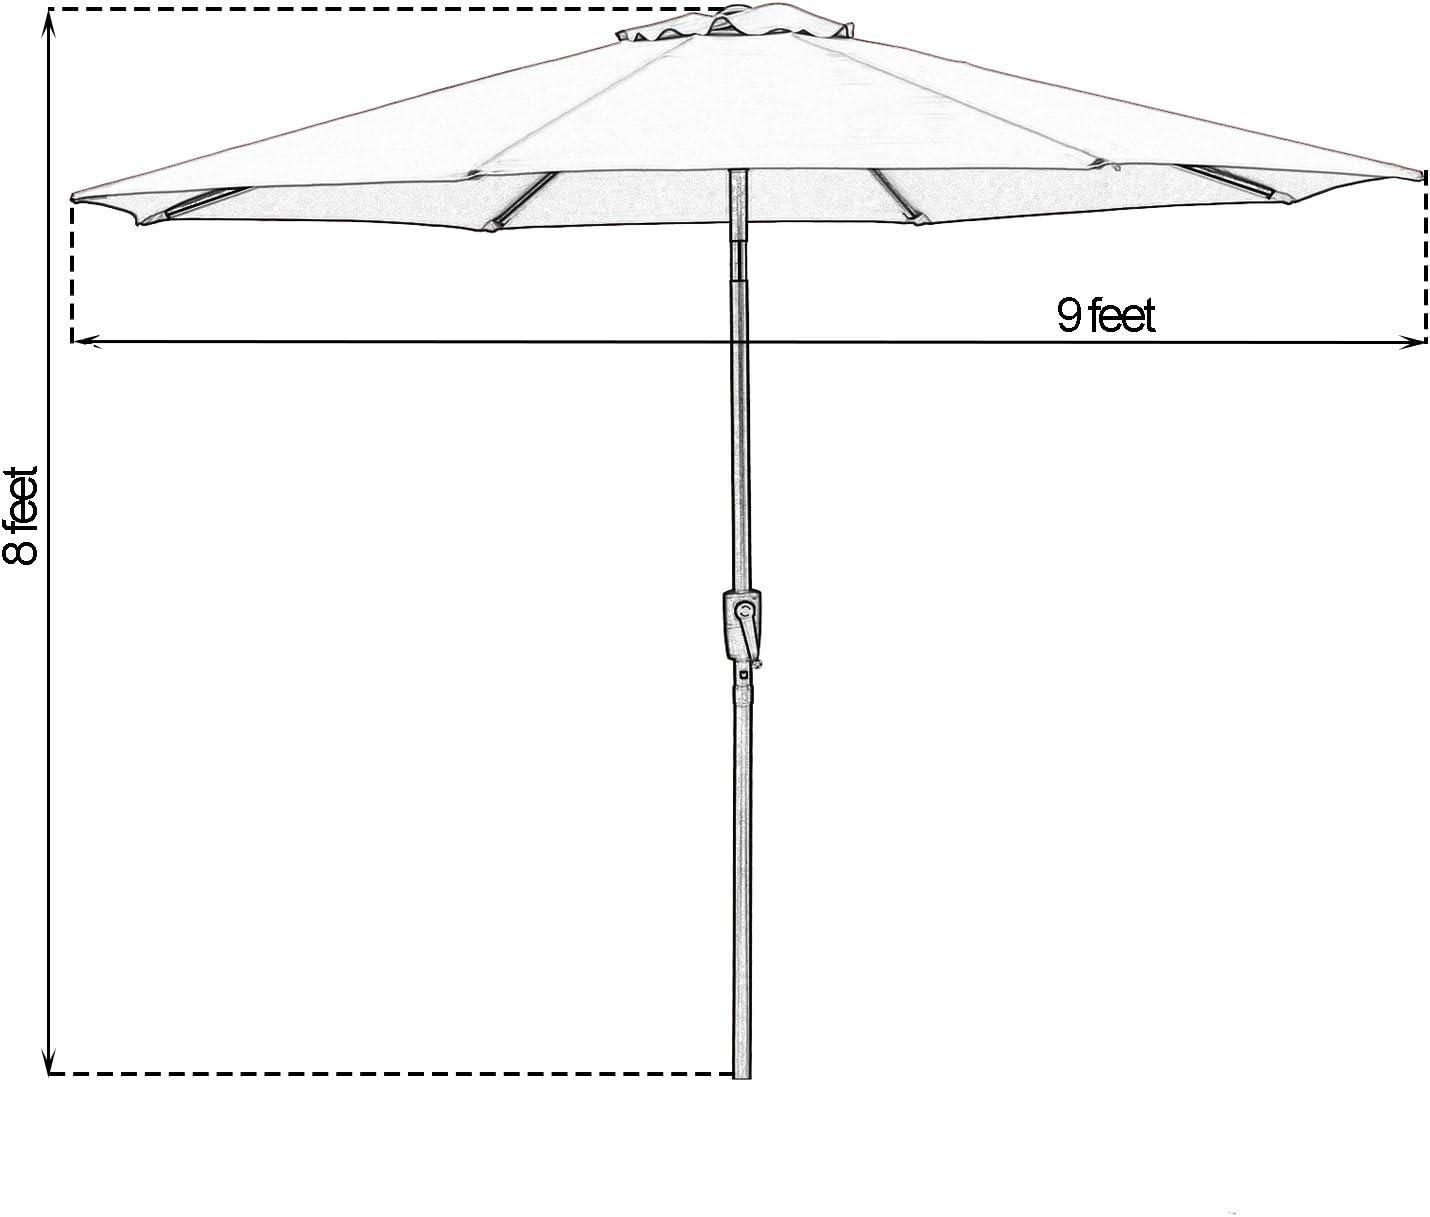 Red SUNBRANO 9 Feet Patio Umbrella Outdoor Aluminum Market Table Umbrella with Push Button Tilt and Crank 8 Steel Ribs